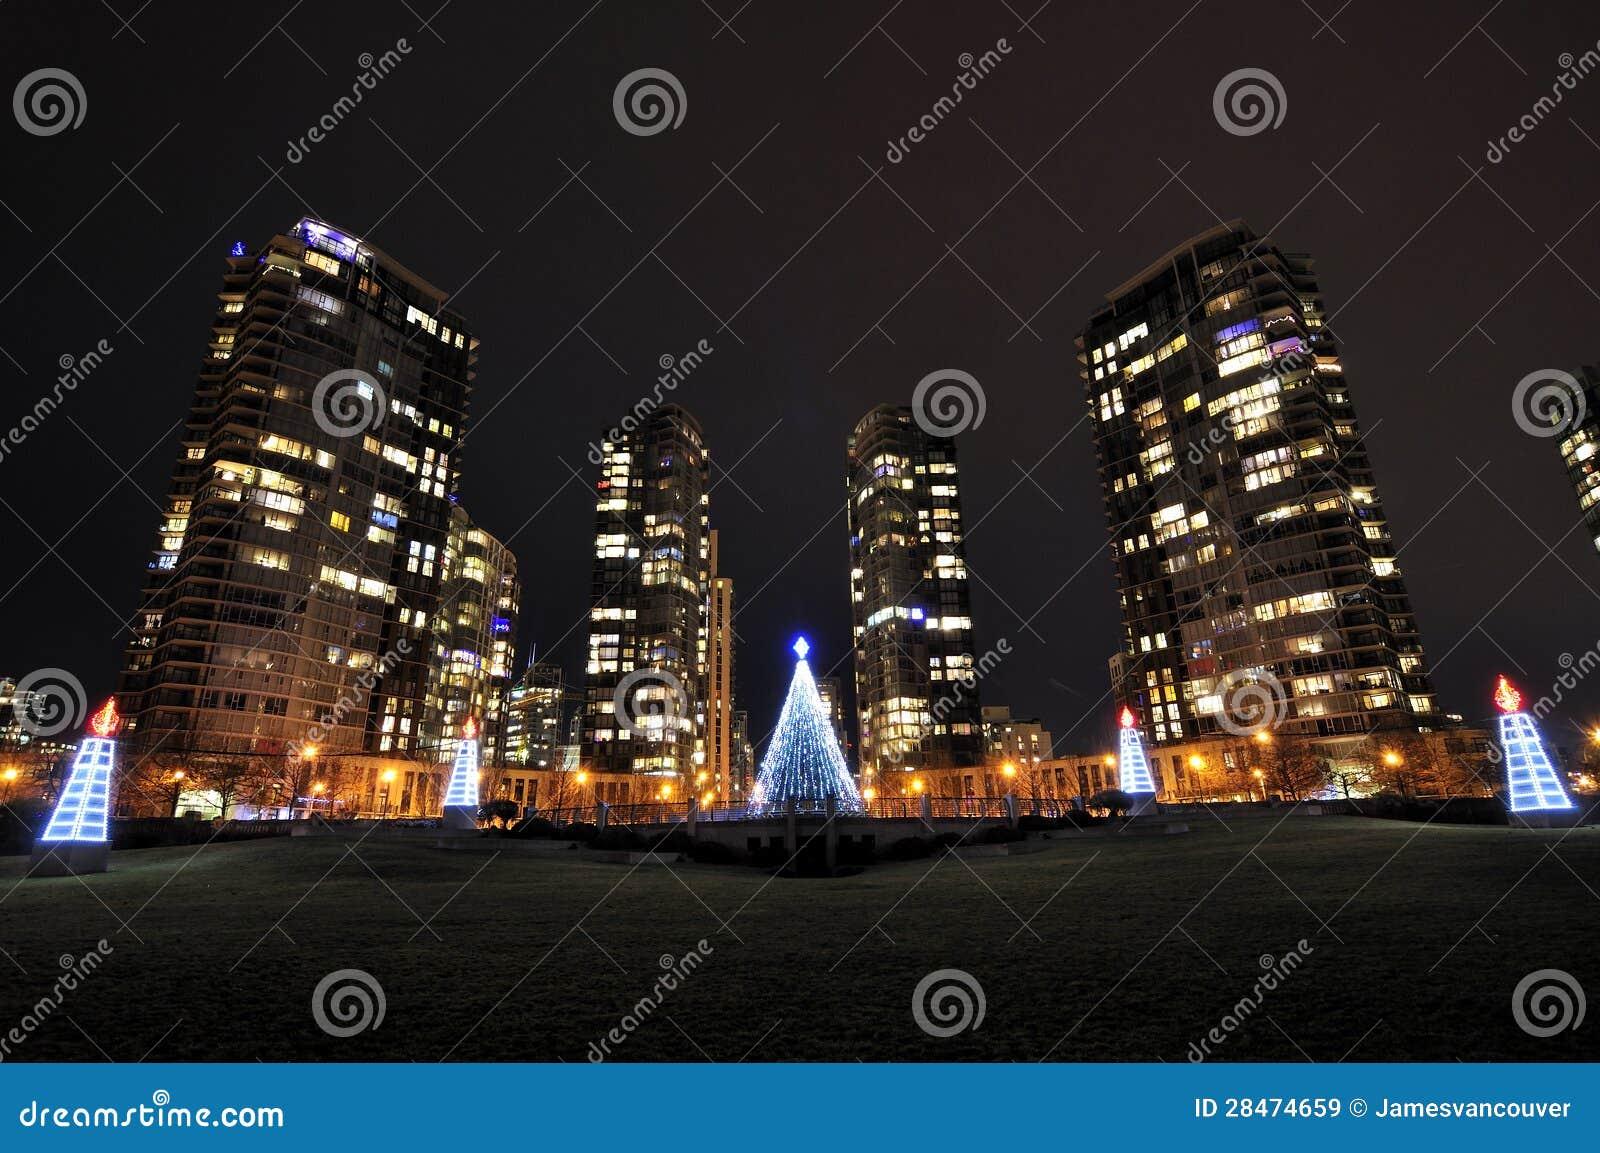 Top 28 Christmas Light Viewing 2007 Christmas Night